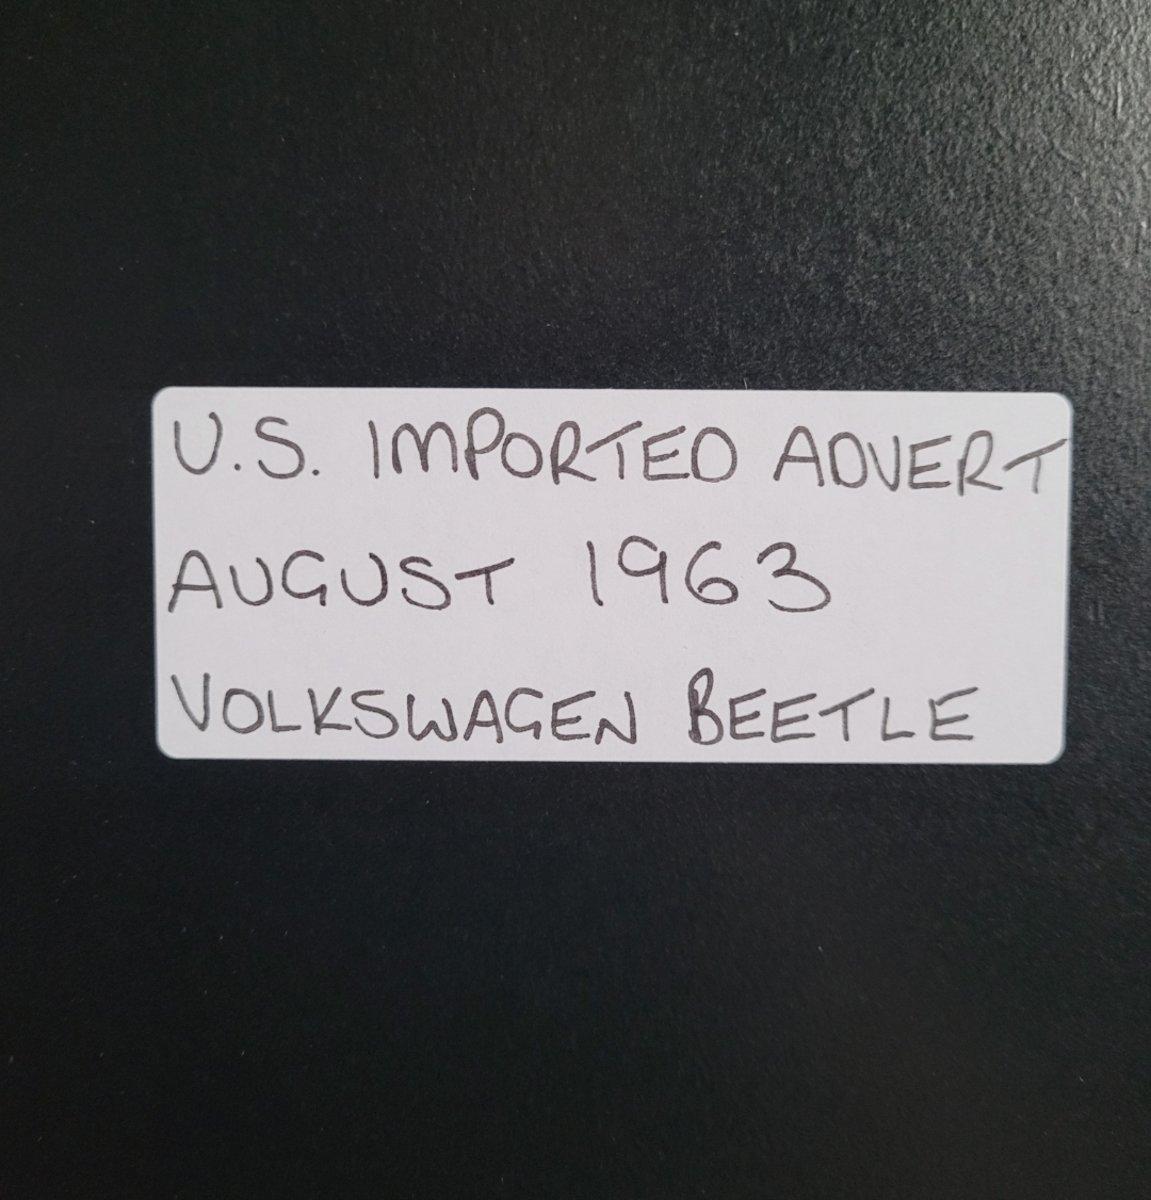 1992 Original 1963 Volkswagen Beetle Framed Advert For Sale (picture 2 of 3)